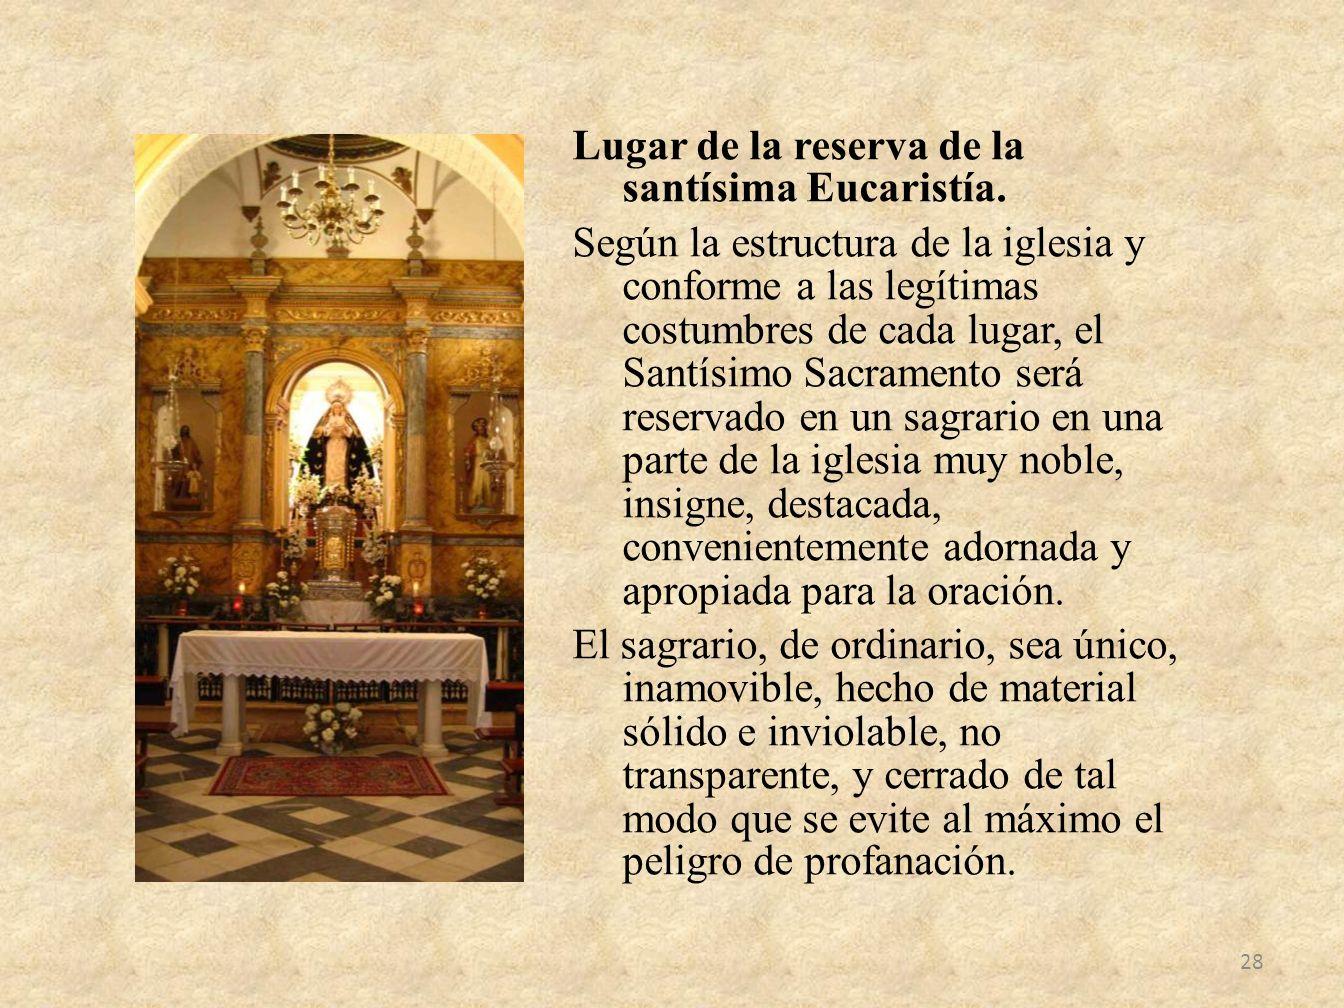 Lugar de la reserva de la santísima Eucaristía